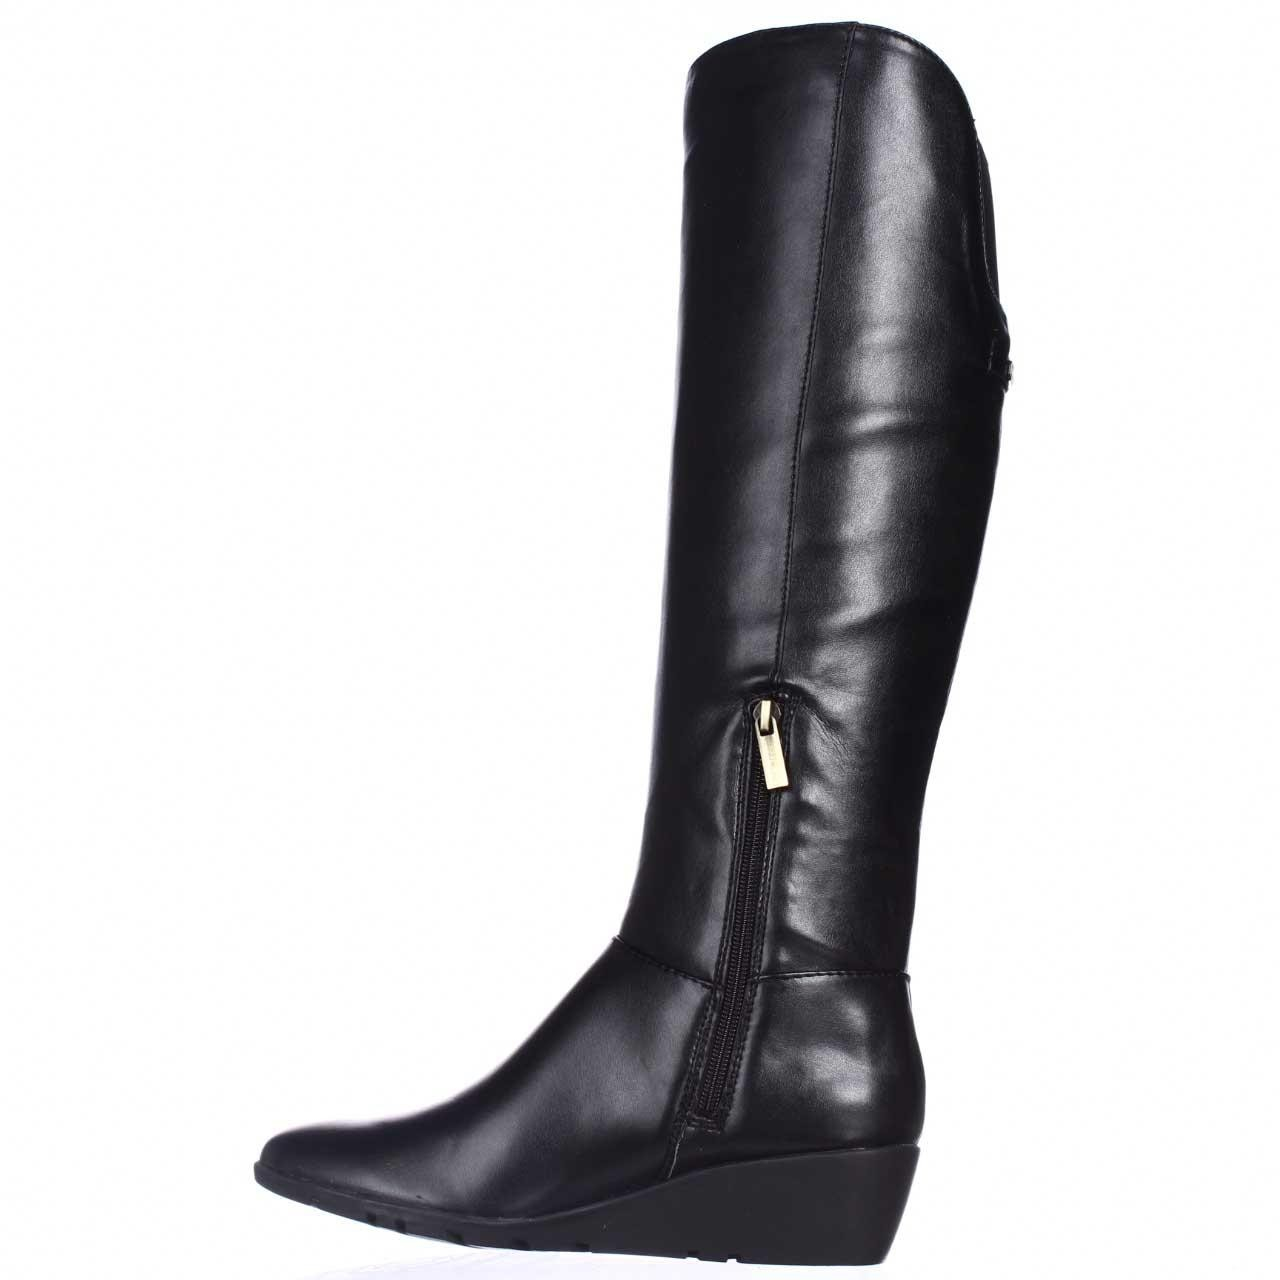 bandolino aliba wedge dress boots in black lyst